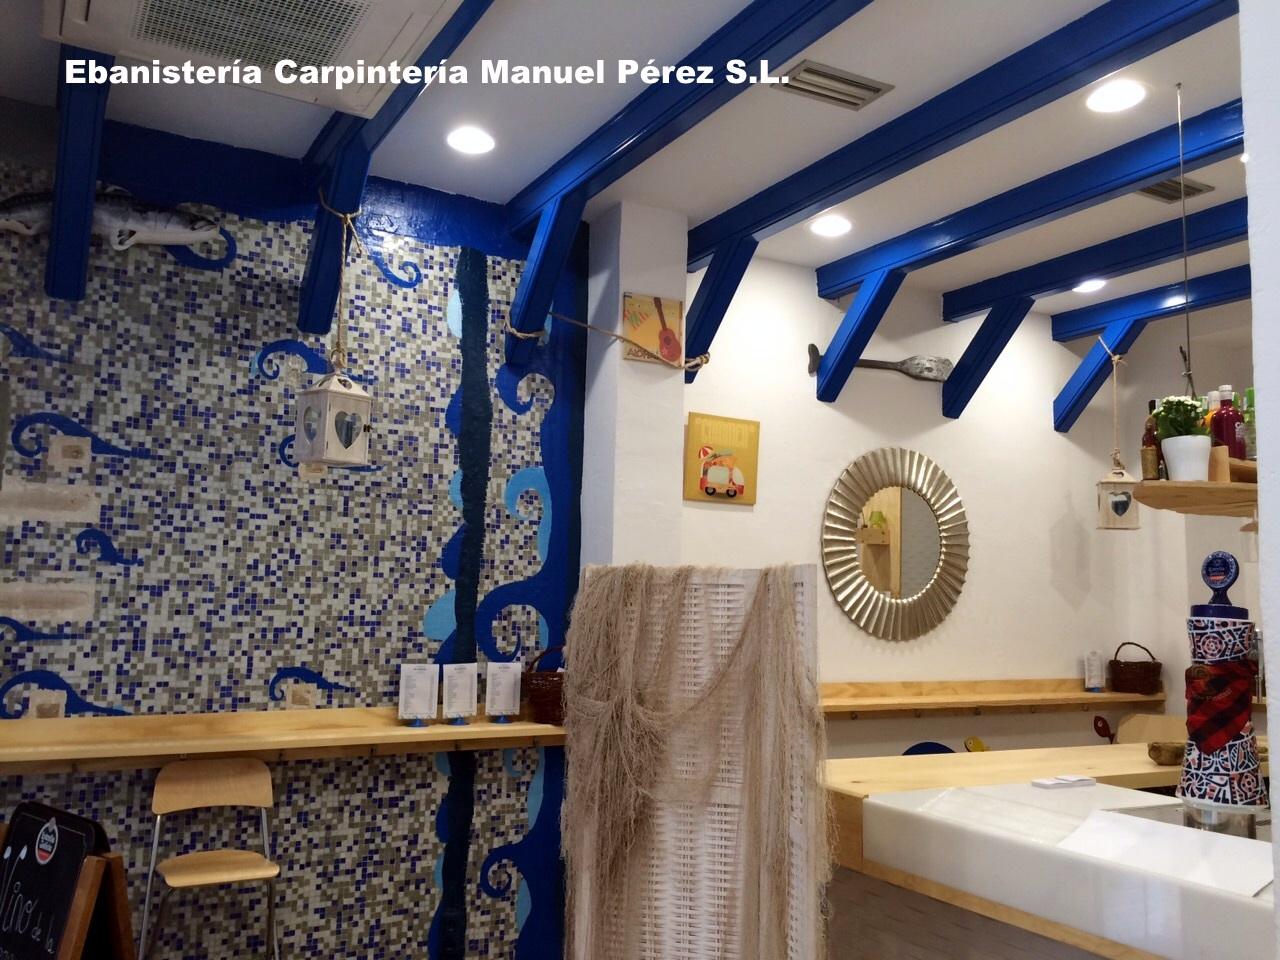 Ebanisteria carpinteria manuel perez zaragoza for Decoracion hogar zaragoza